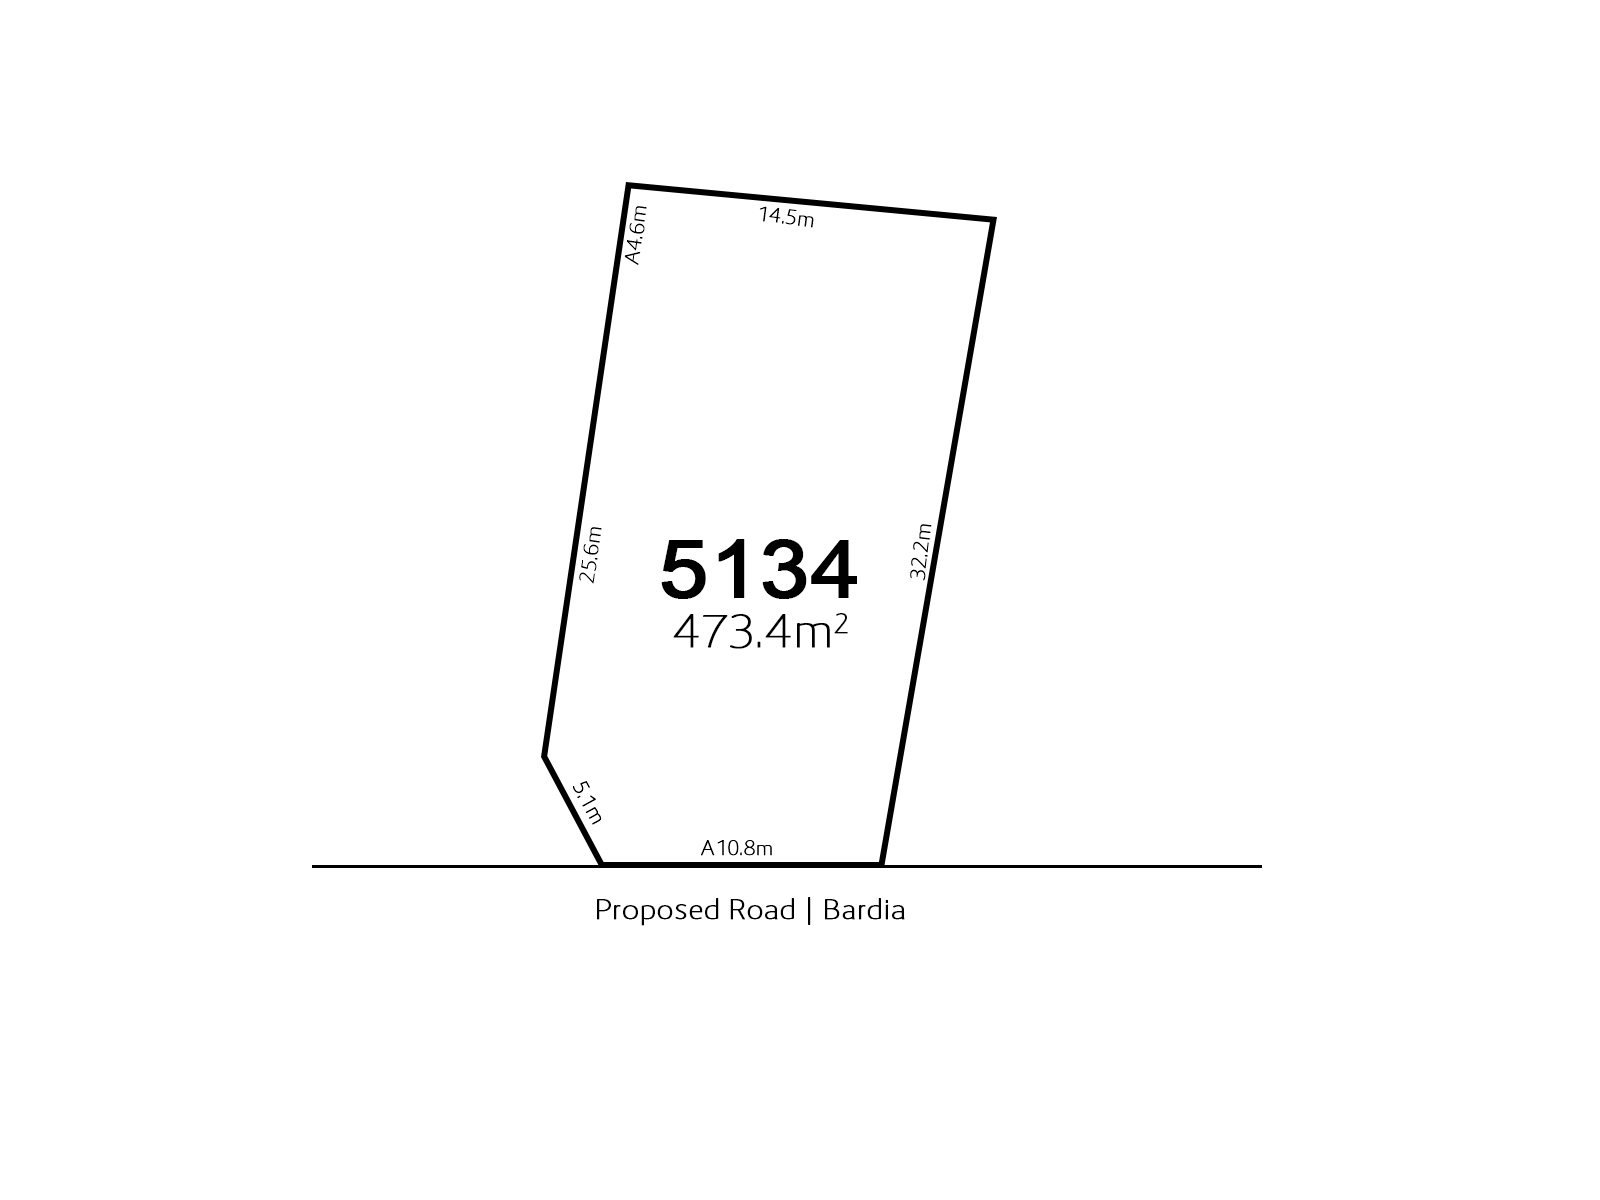 Bardia LOT 5134 Proposed Road | Bardia